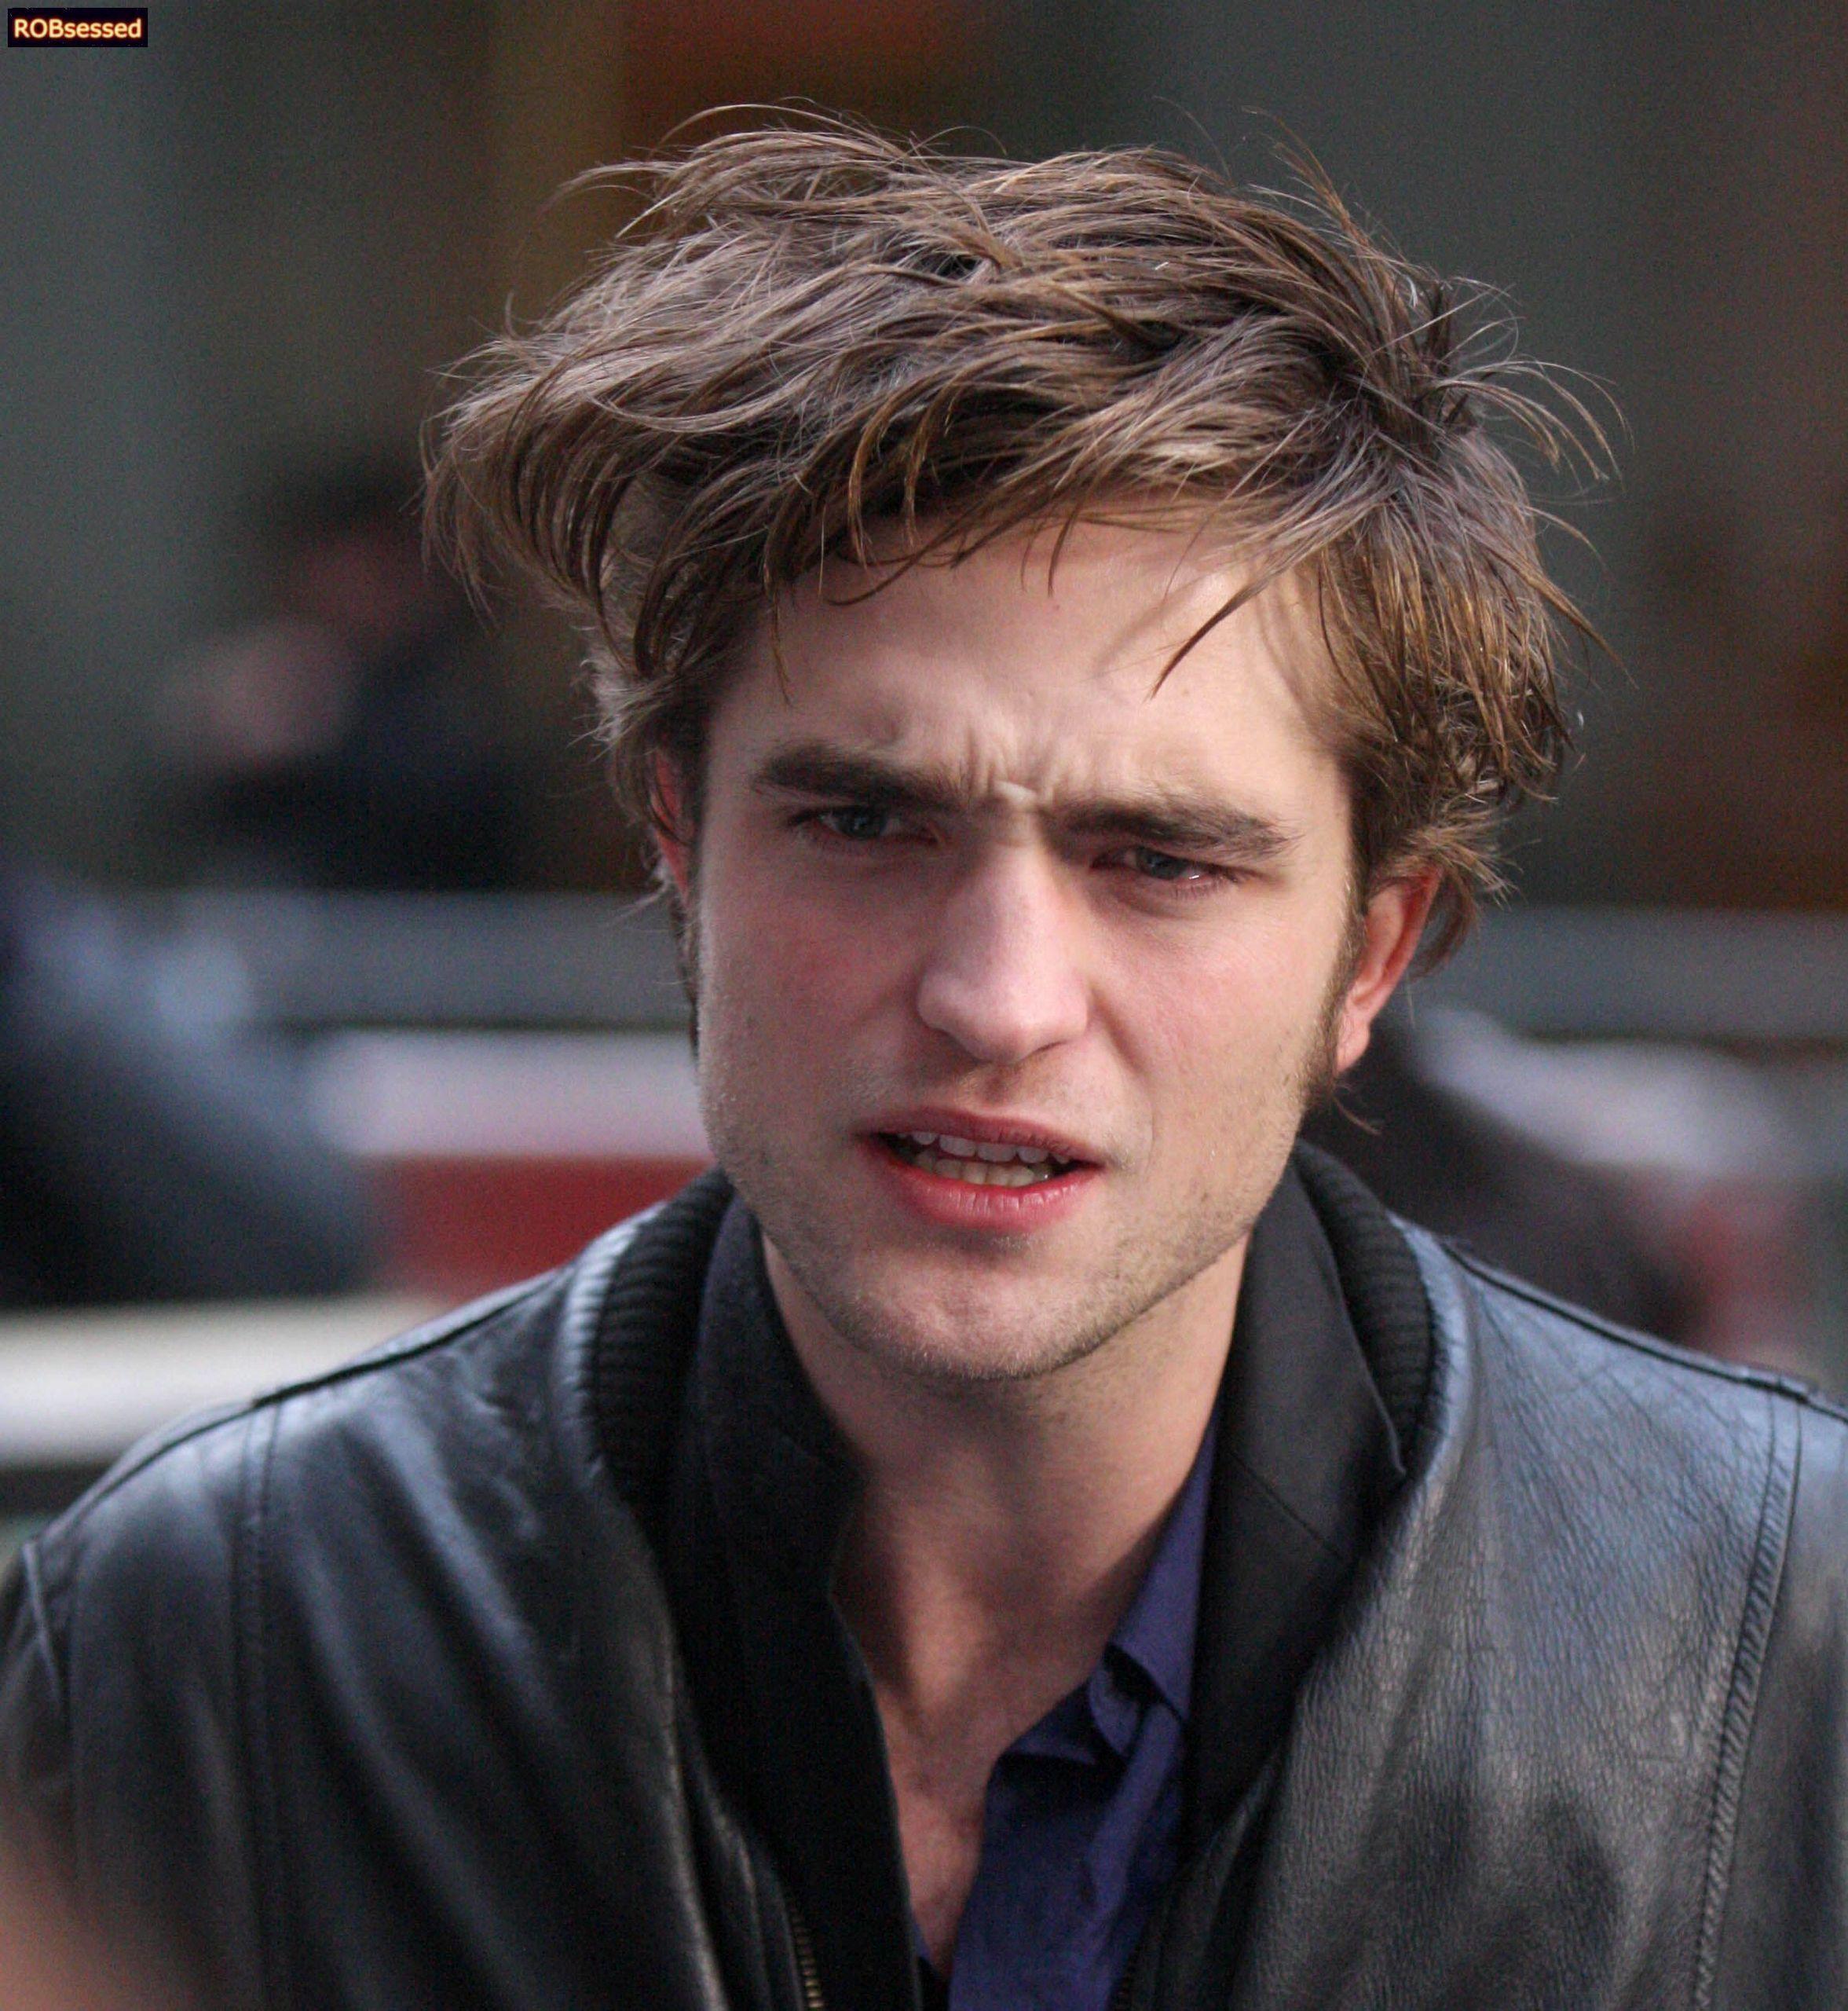 Robert Pattinson in NYC November 2008